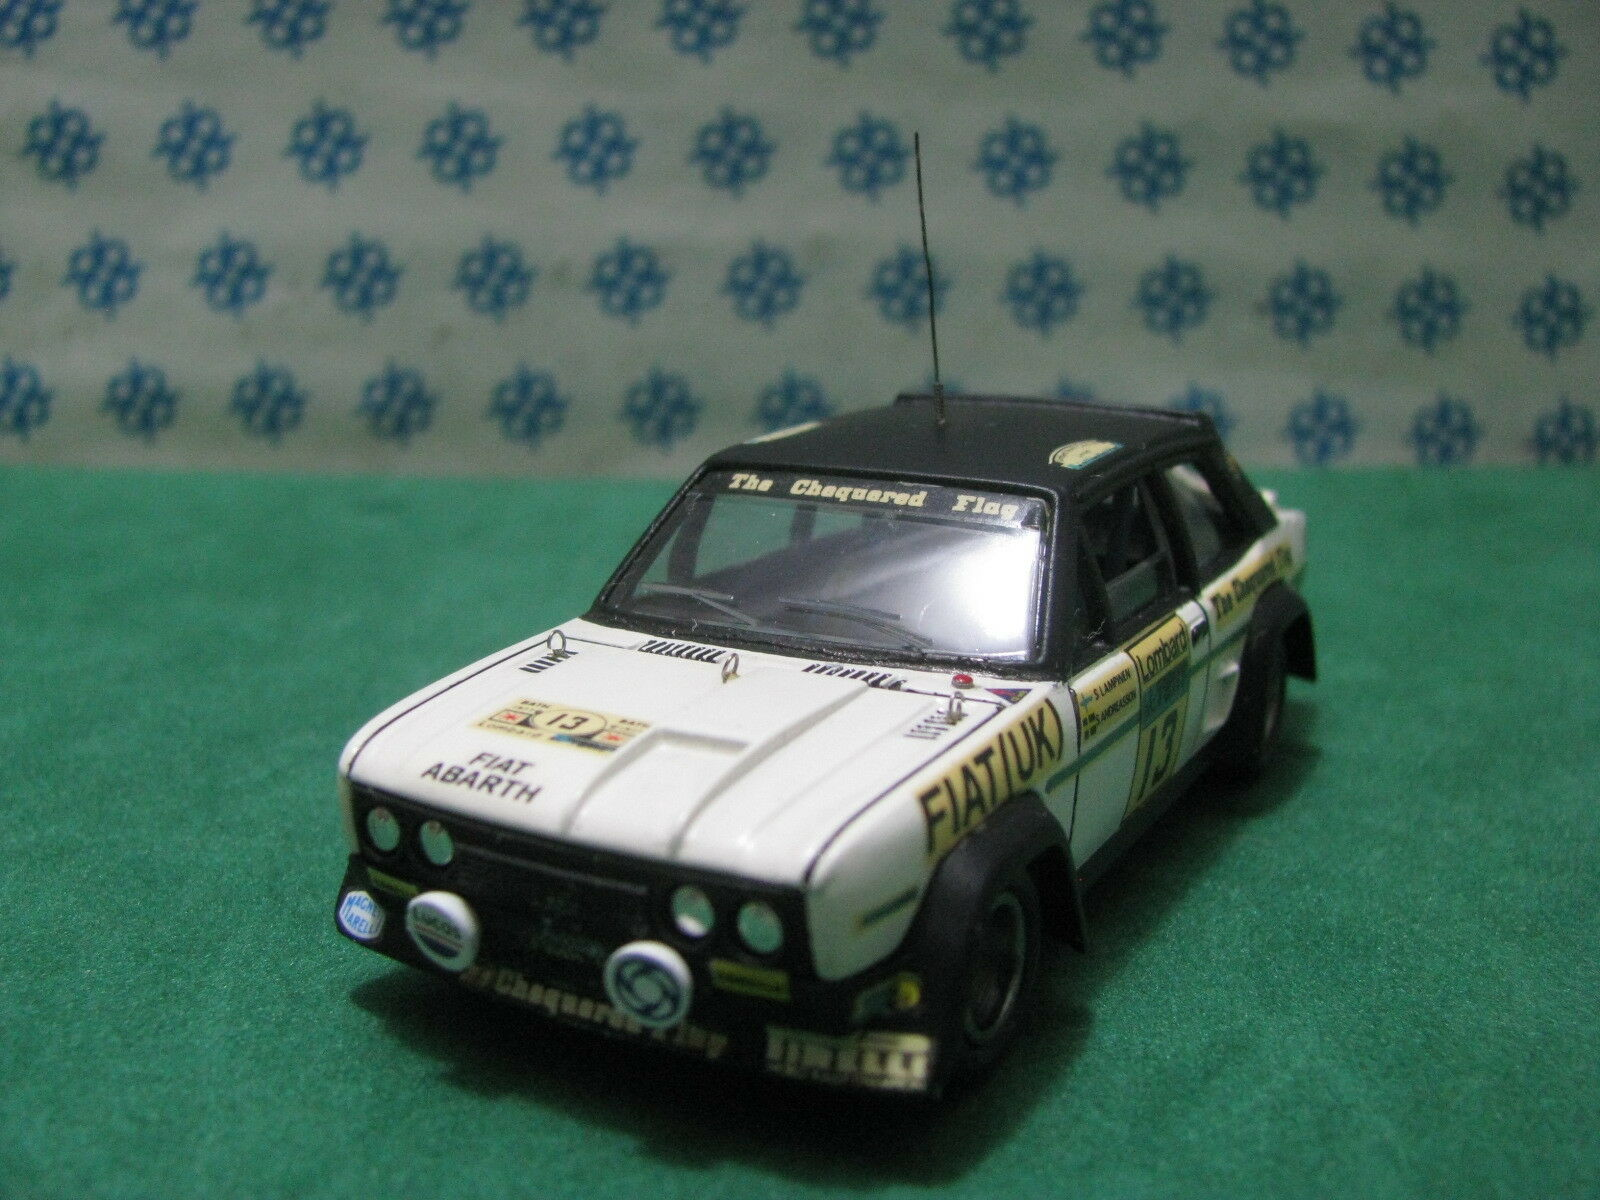 Vintage - FIAT 131 Mirafiori Abarth - 1 43 Elab. base Solido 1977